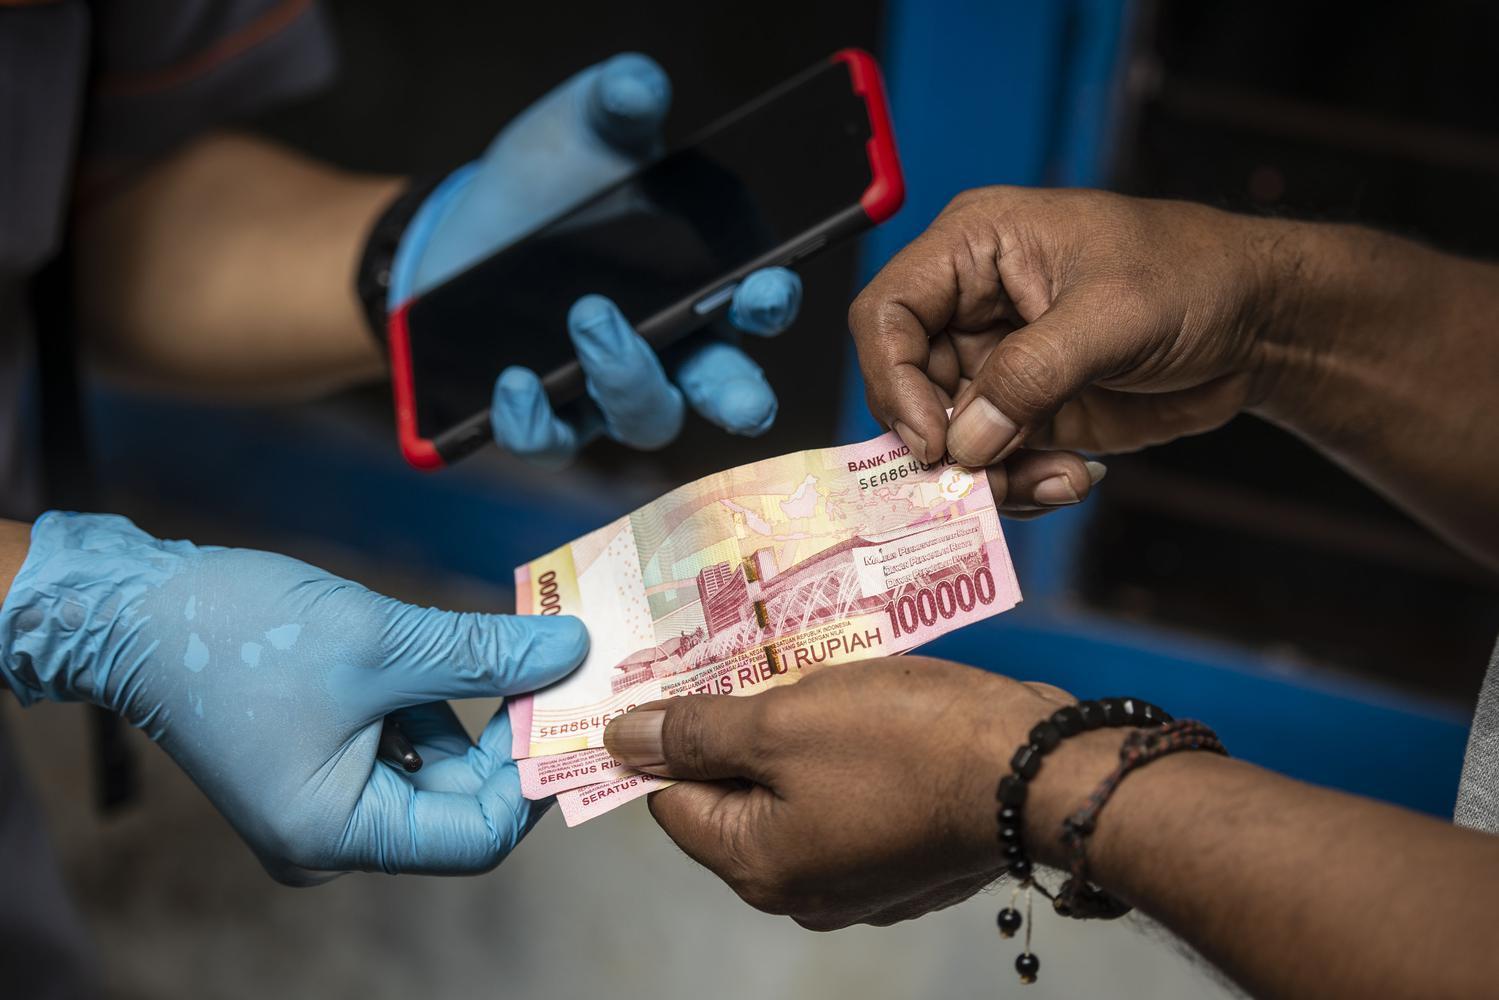 Petugas PT Pos Indonesia menyalurkan Bantuan Sosial Tunai (BST) kepada warga RW 05 di kawasan Kelurahan Kenari, Senen, Jakarta, Rabu (6/1/2021). Pemerintah mulai menyalurkan Bantuan Sosial Tunai (BST) tahun 2021 untuk empat bulan kedepan senilai Rp300 ribu per Keluarga Penerima Manfaat (KPM) yang diberikan secara langsung kepada warga melalui petugas PT Pos Indonesia dan bank-bank milik negara.